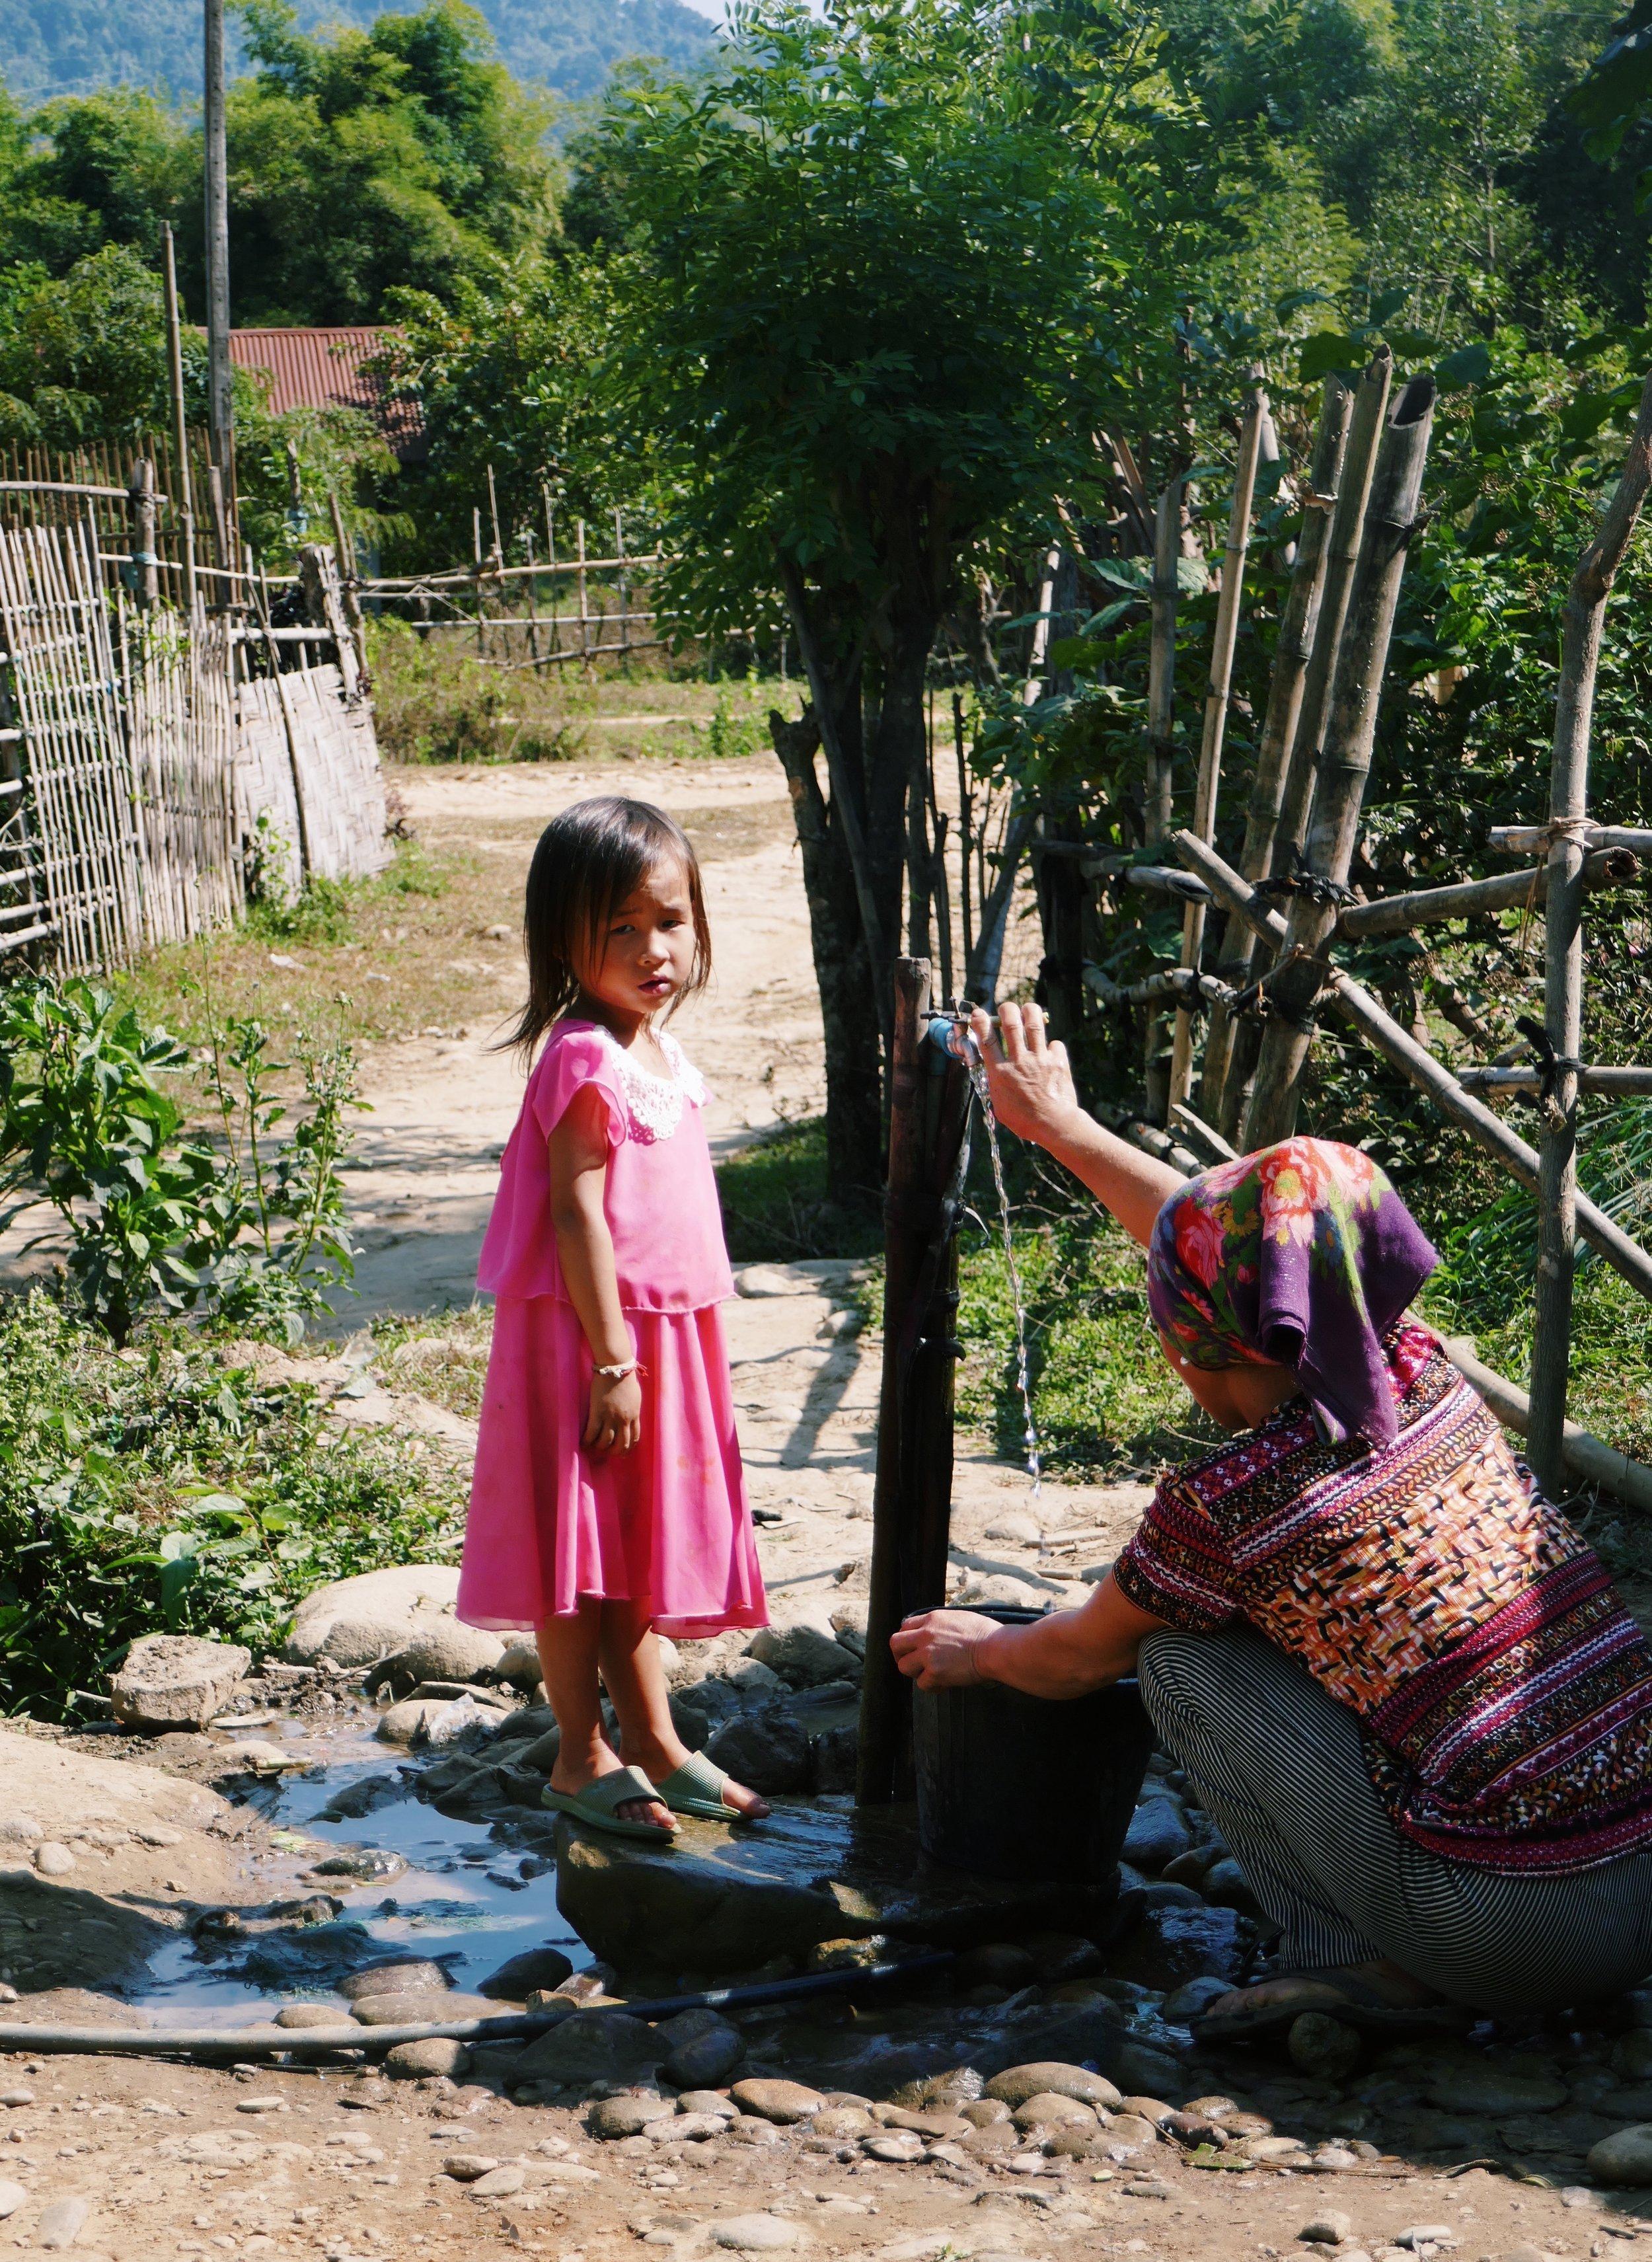 Vang Vieng Travel Blog